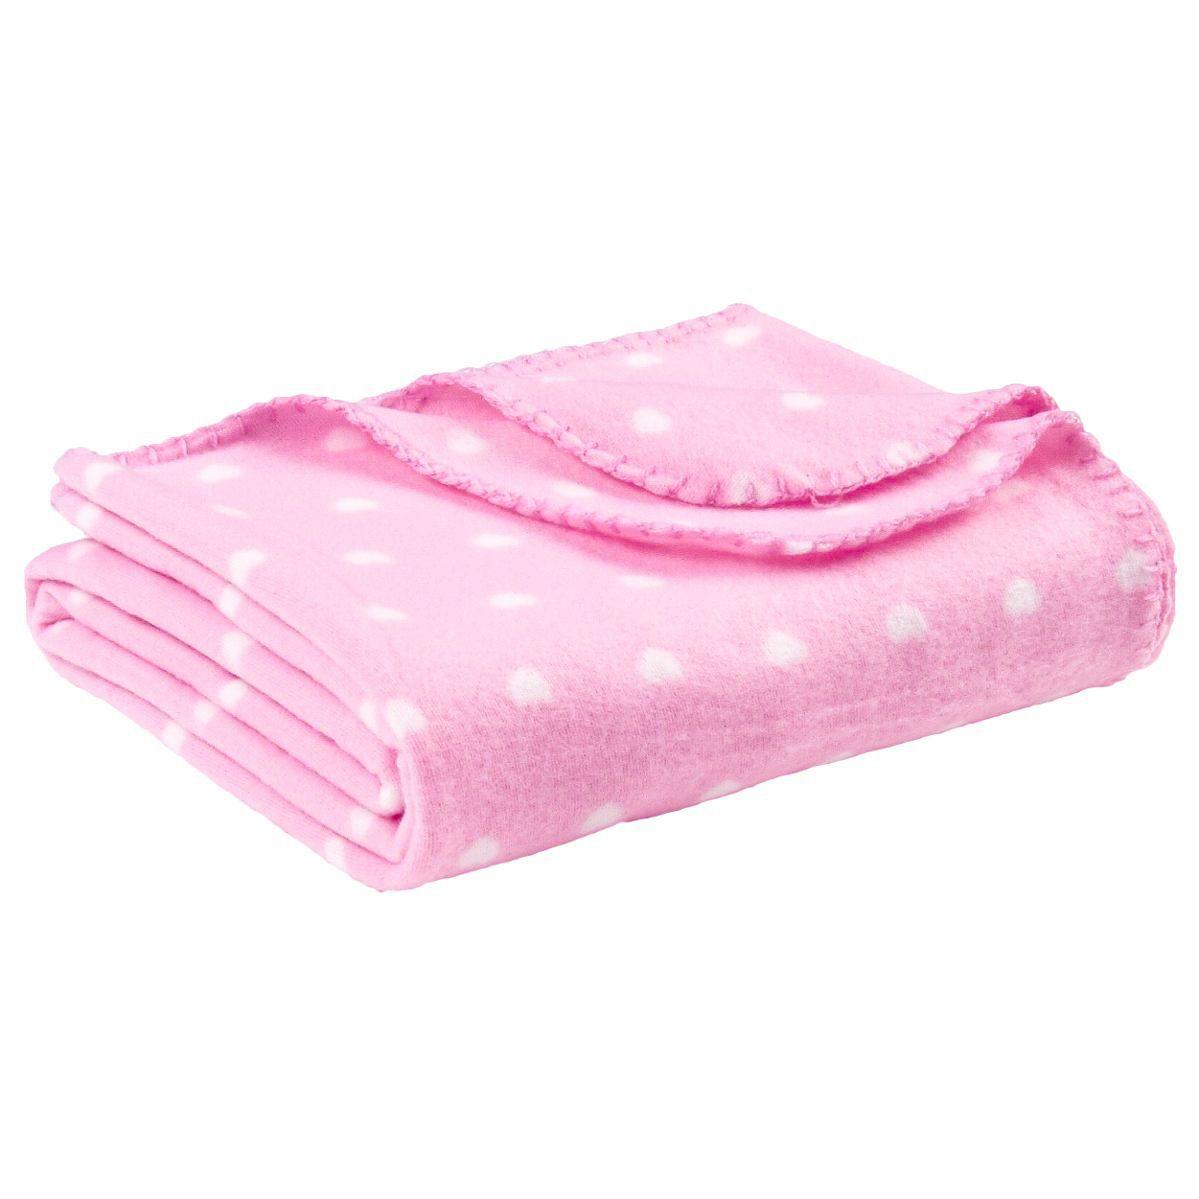 plaid polaire 150 cm coeur rose p le plaid cocooning eminza. Black Bedroom Furniture Sets. Home Design Ideas